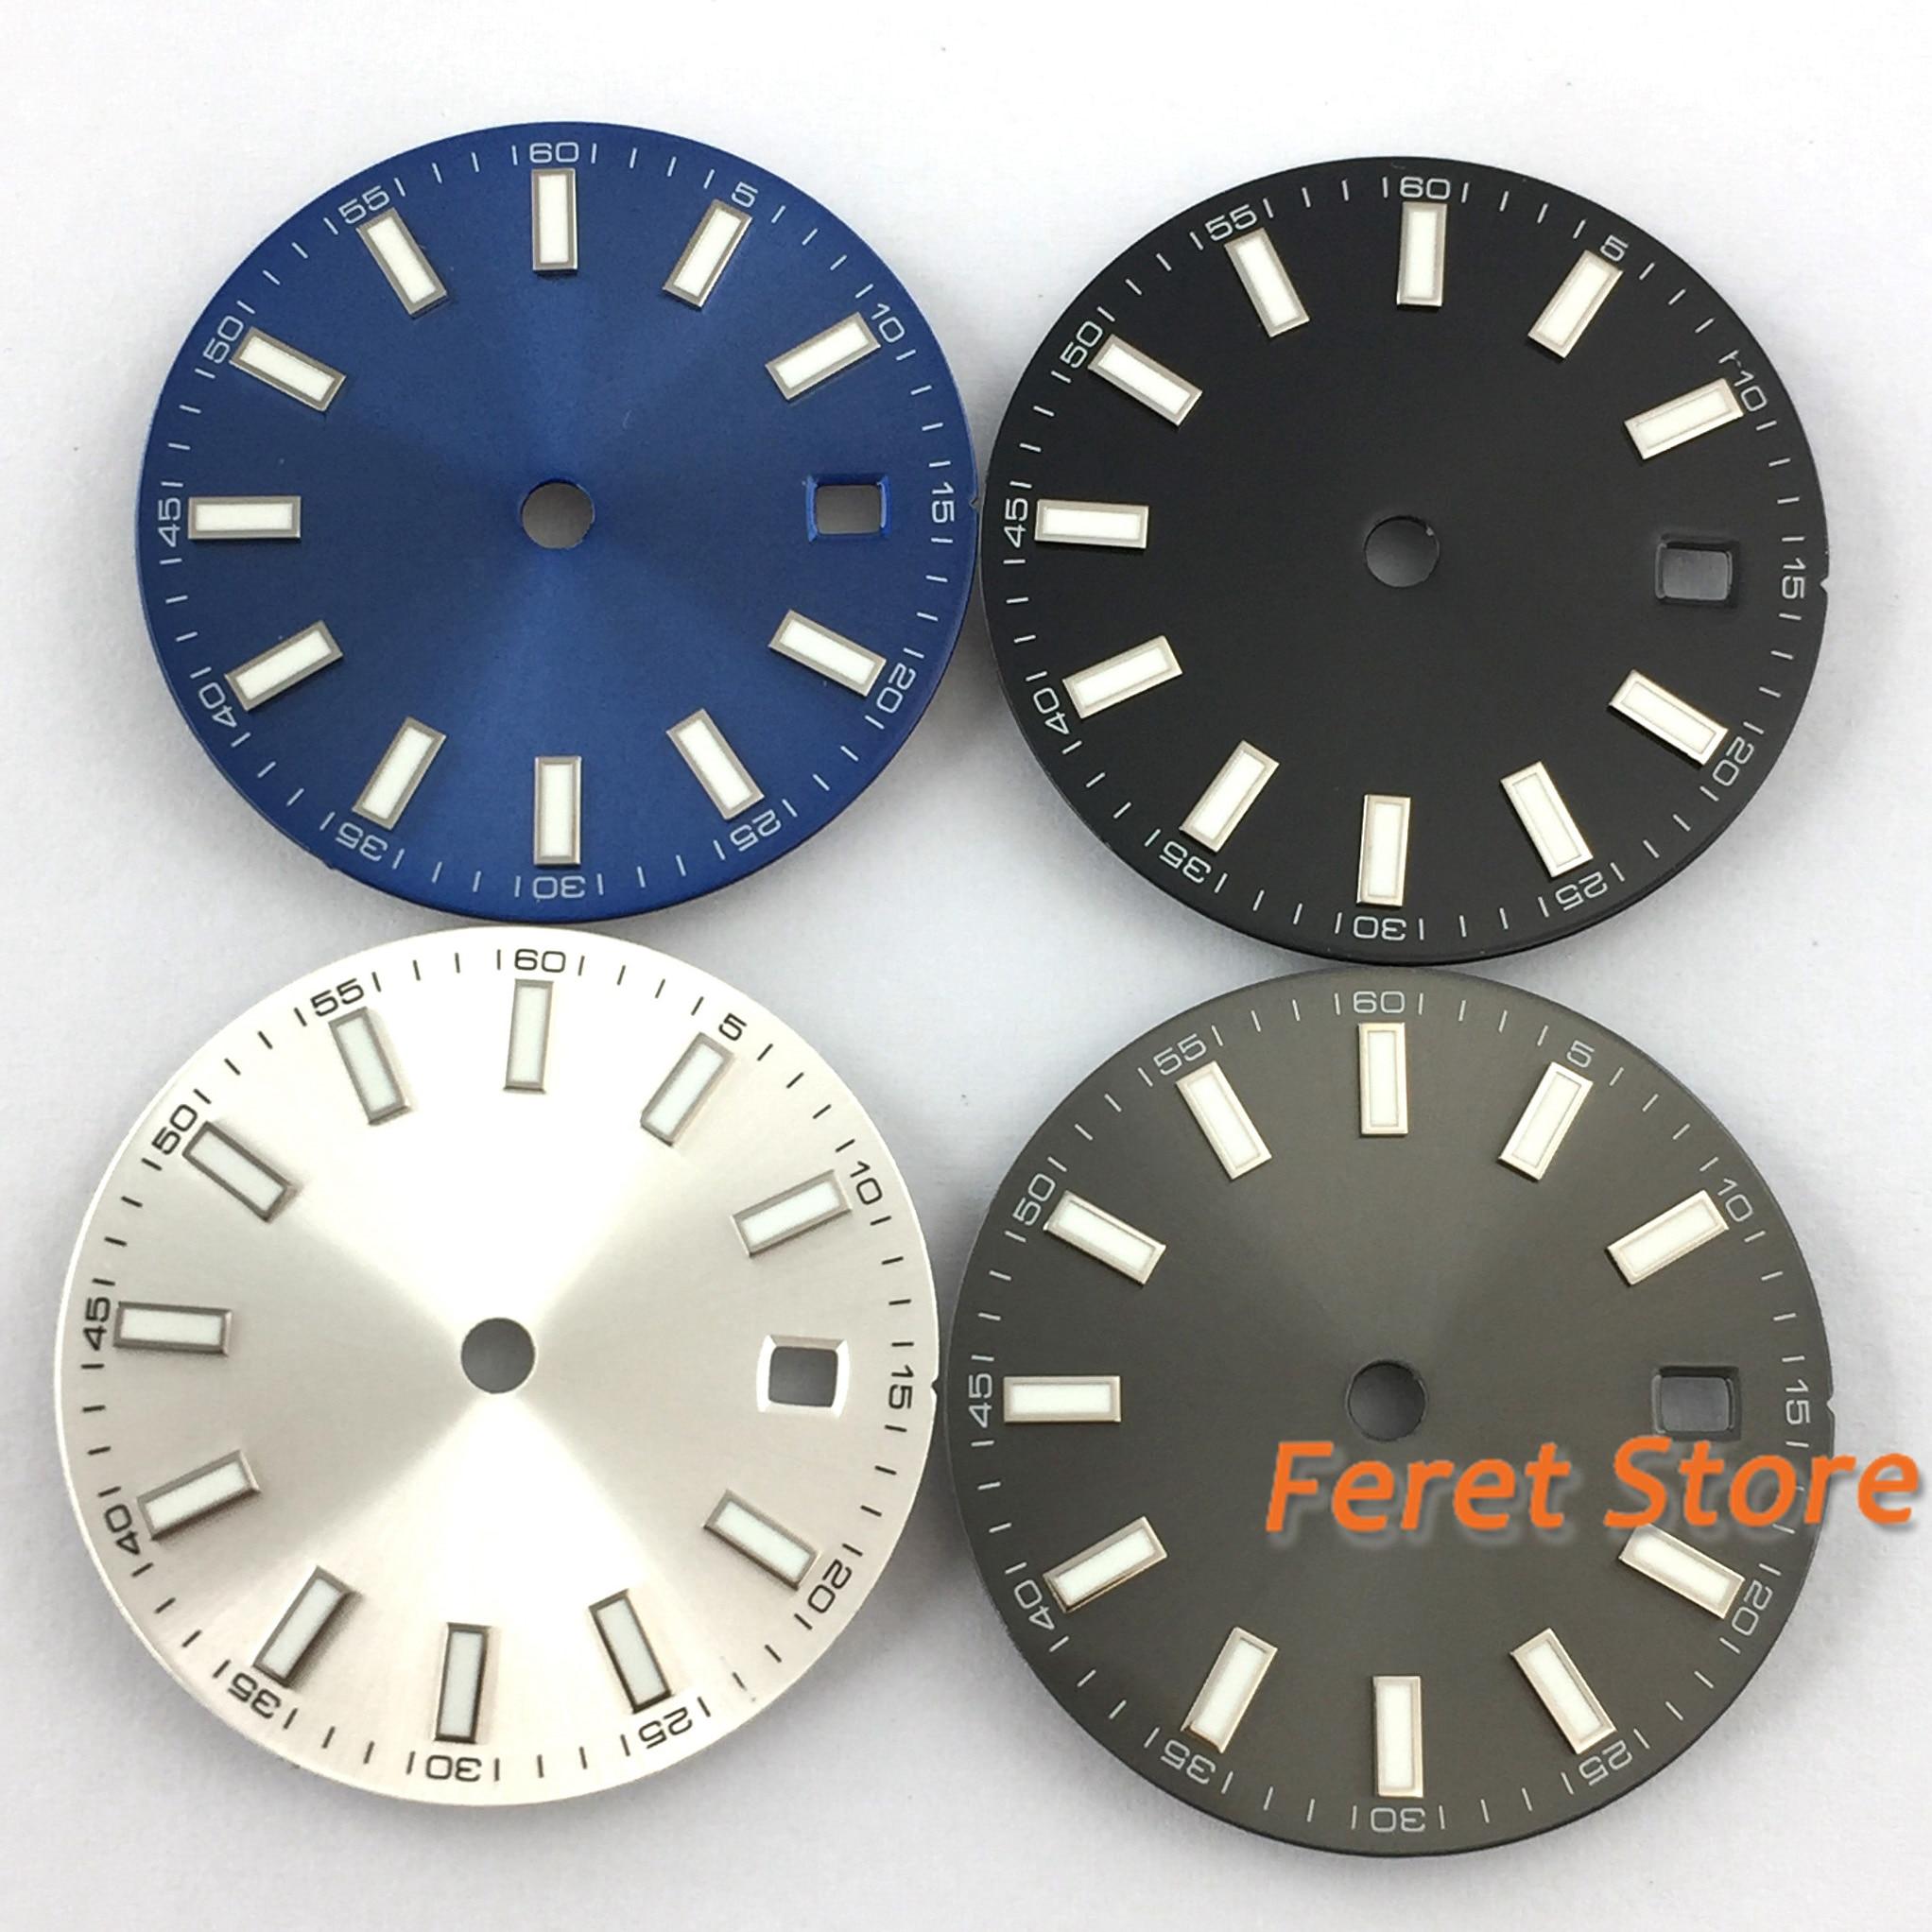 29,2mm sin logo reloj oscuro dial marcas luminosas ajuste MIYOTA 8215 821A Mingzhu 2813 Eat 2836 automático p205